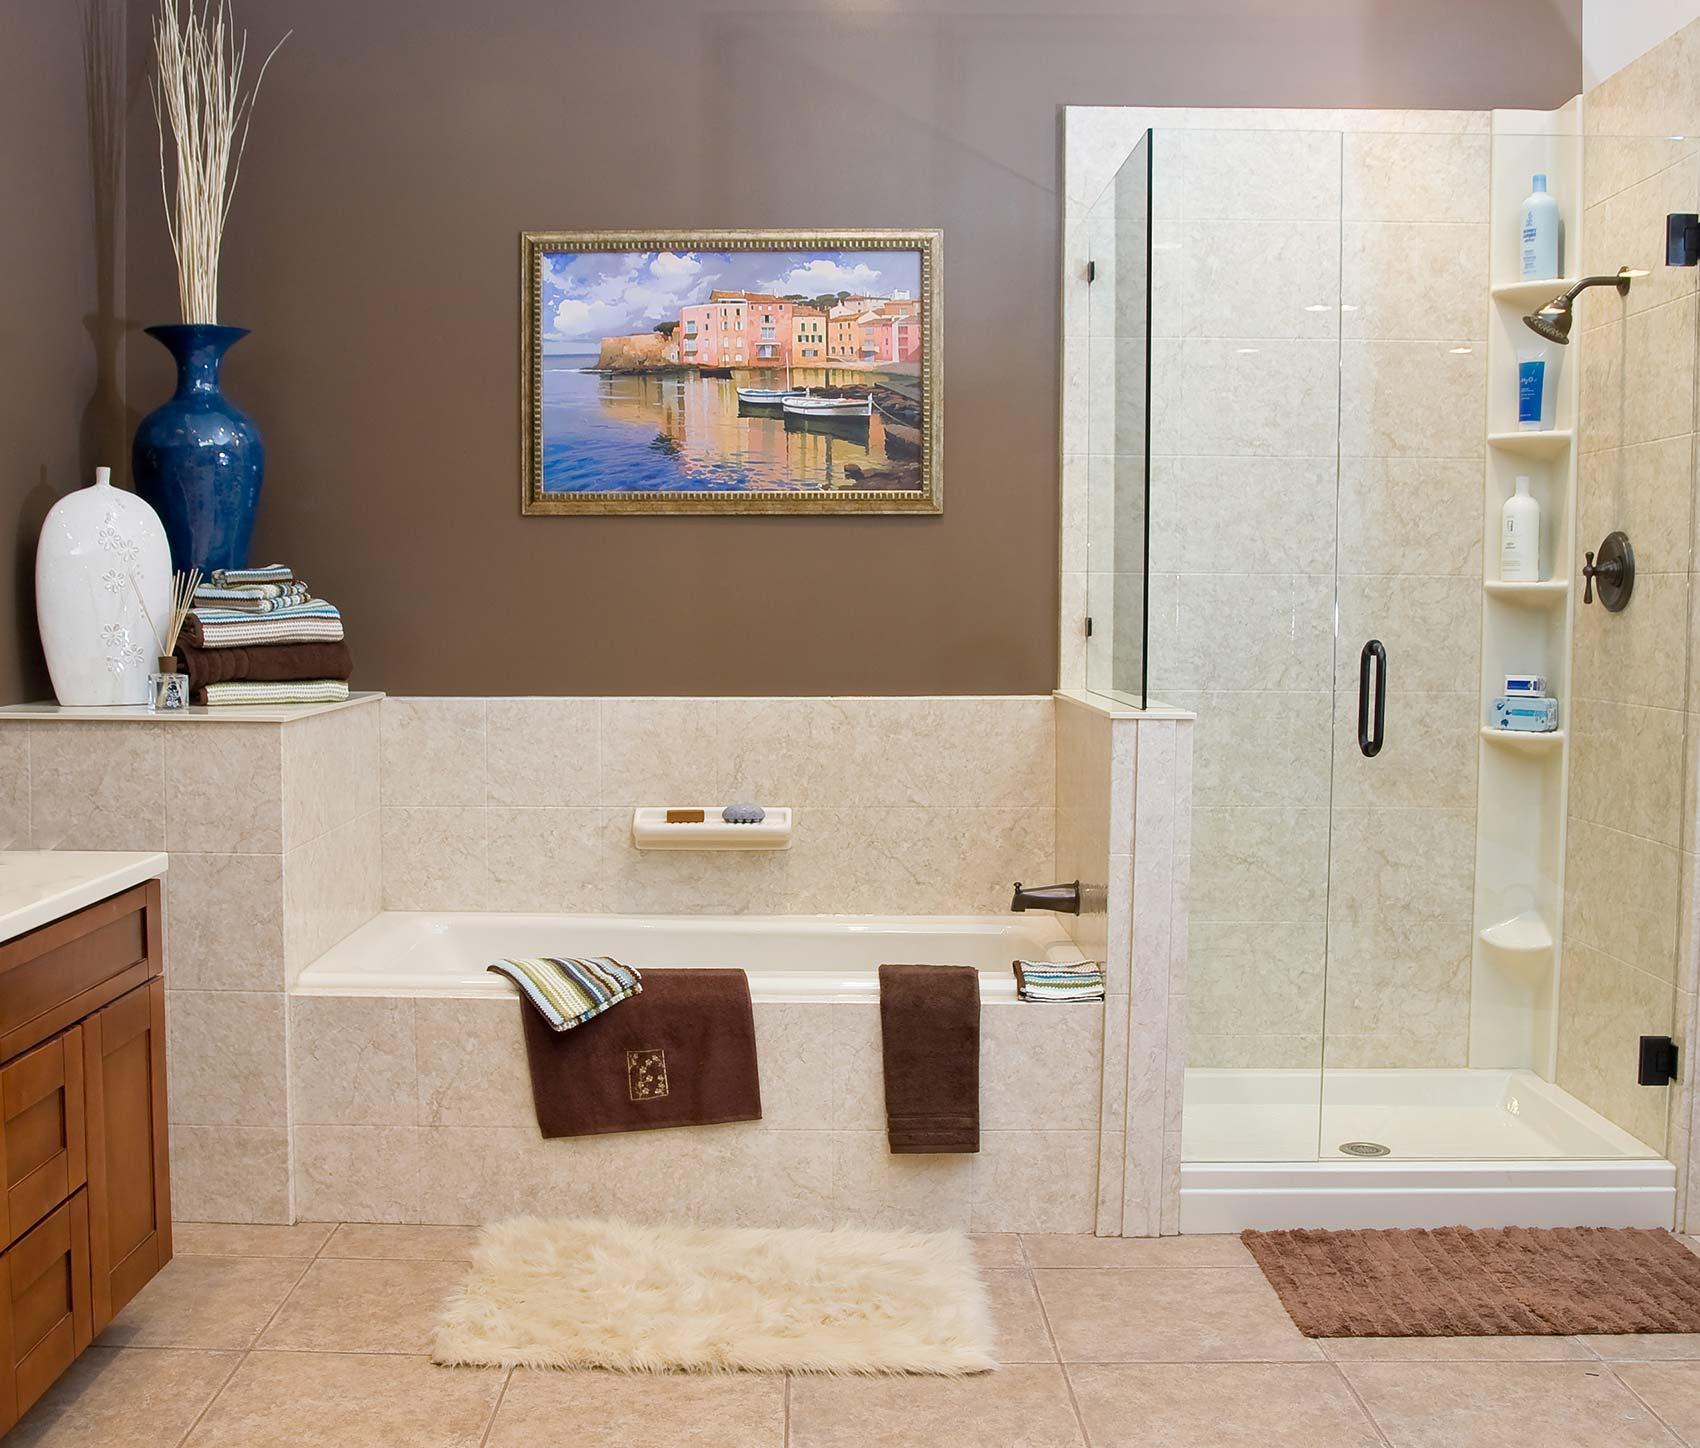 EasyCare Bath Amp Showers Bathroom Remodel